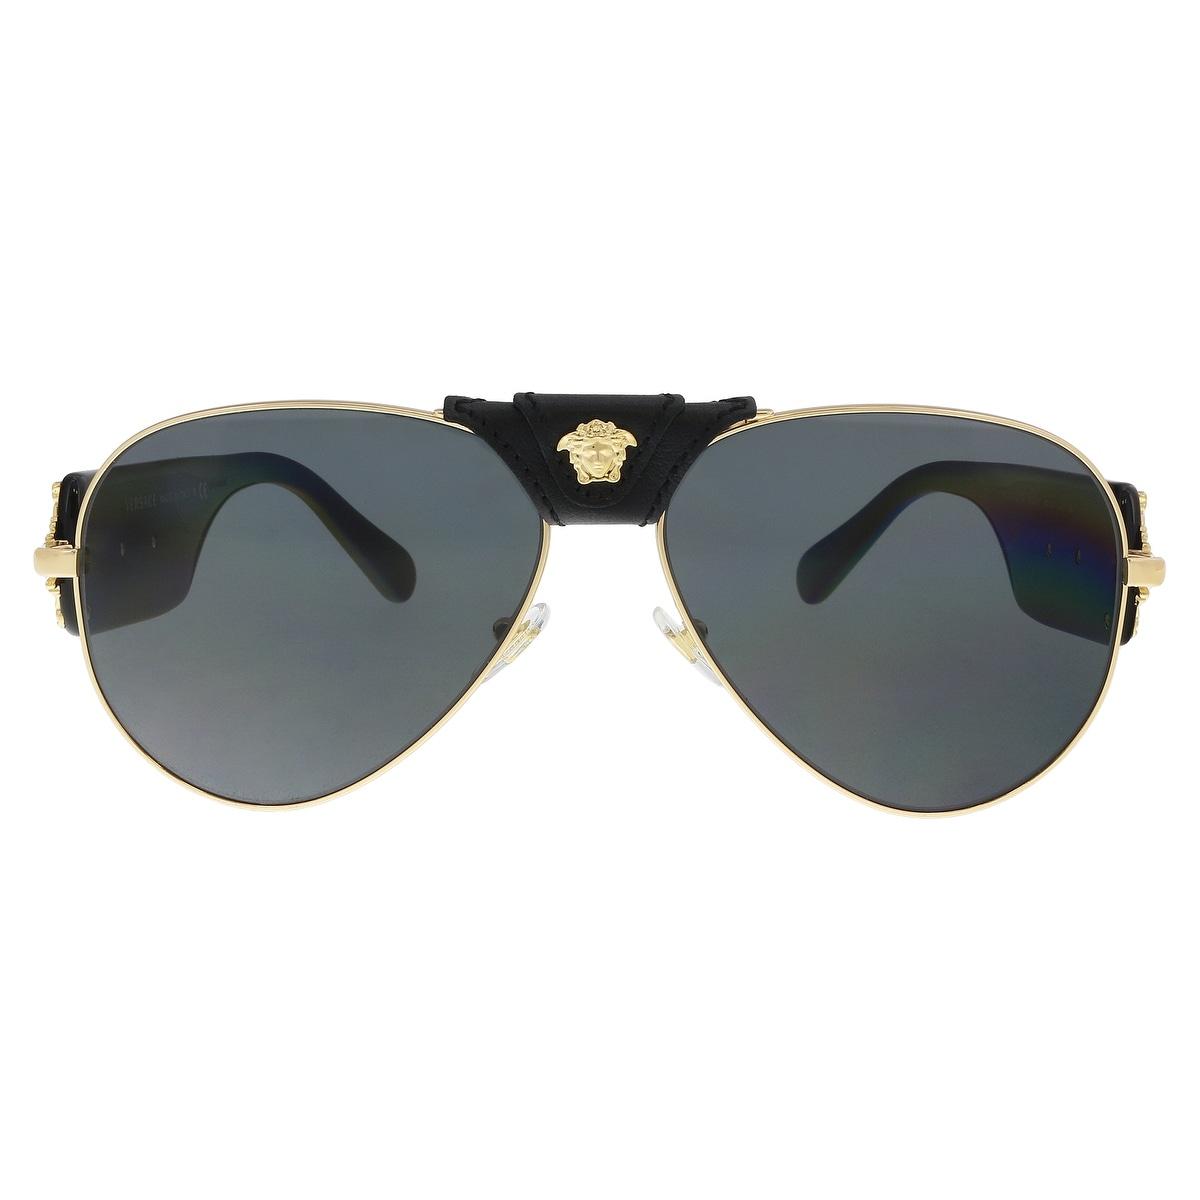 b7862b7ef304 Shop Versace VE2150Q 100287 Gold Aviator Sunglasses - 62-14-140 - Free  Shipping Today - Overstock - 21655478